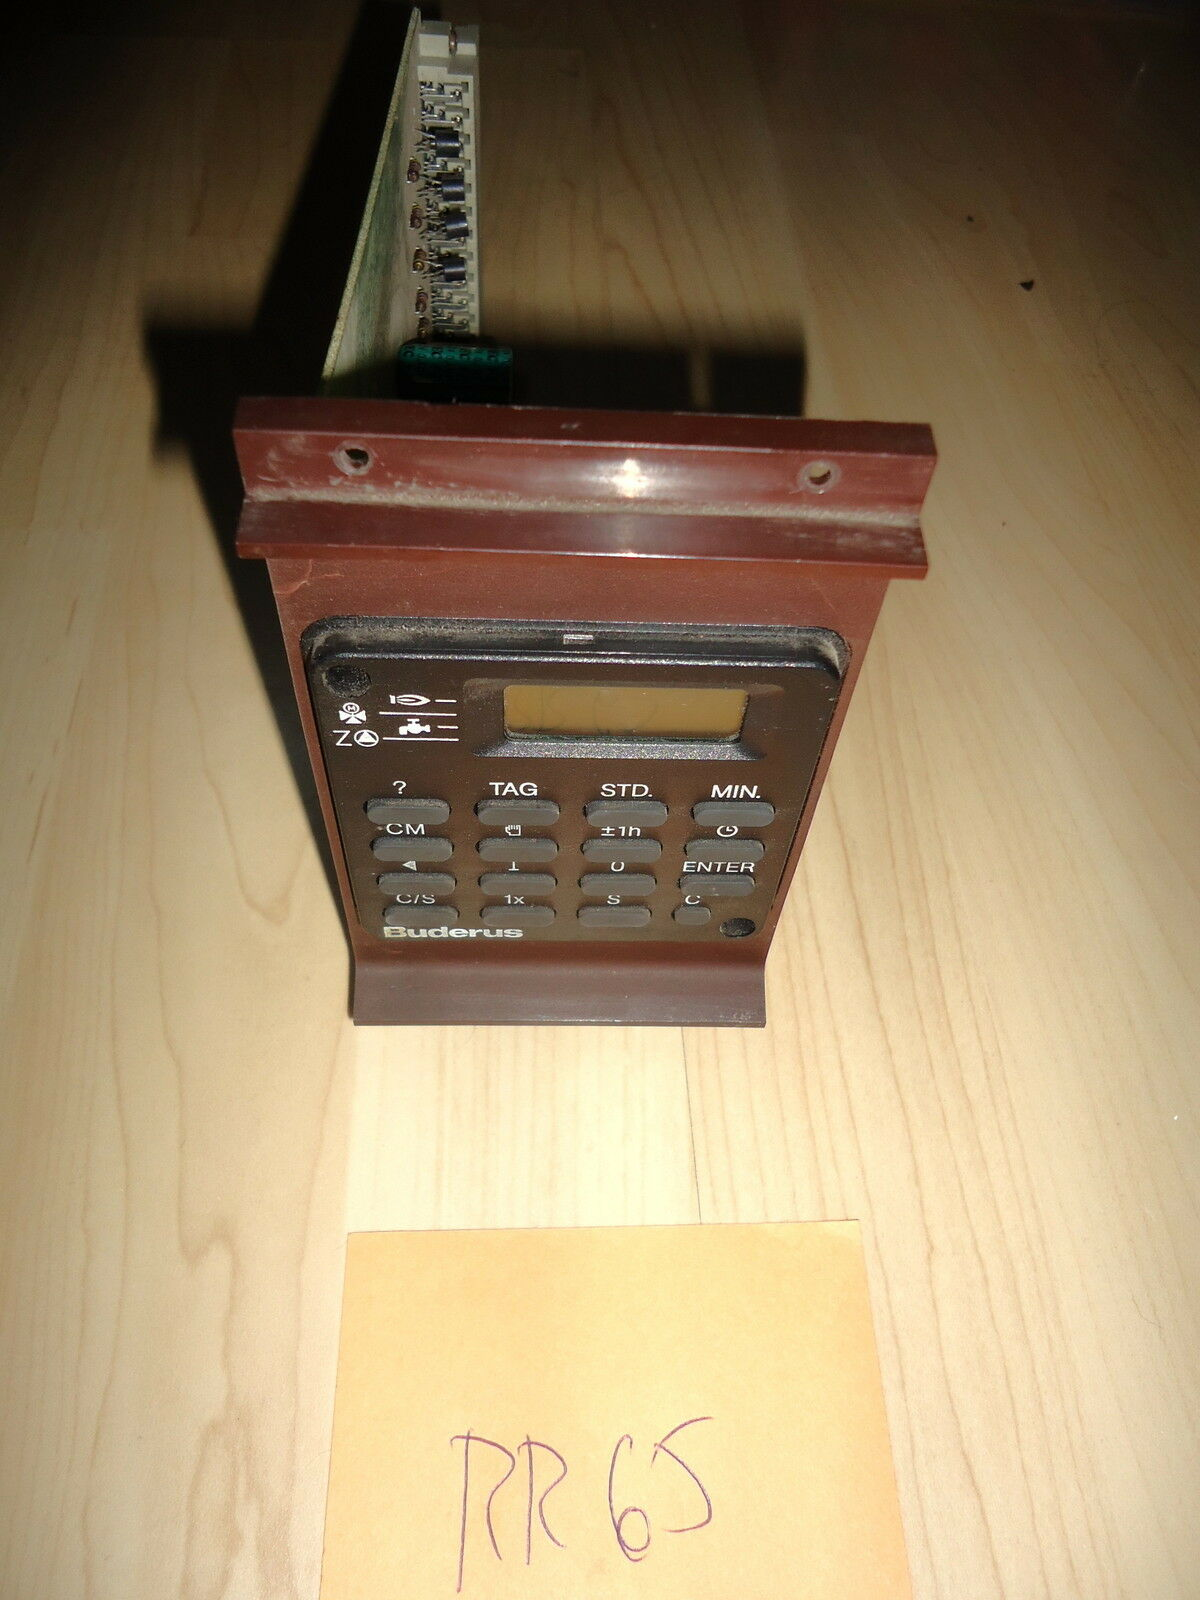 BUDERUS Schaltuhr Modul M007 M007 M007 Nr. RR65 4c85a5